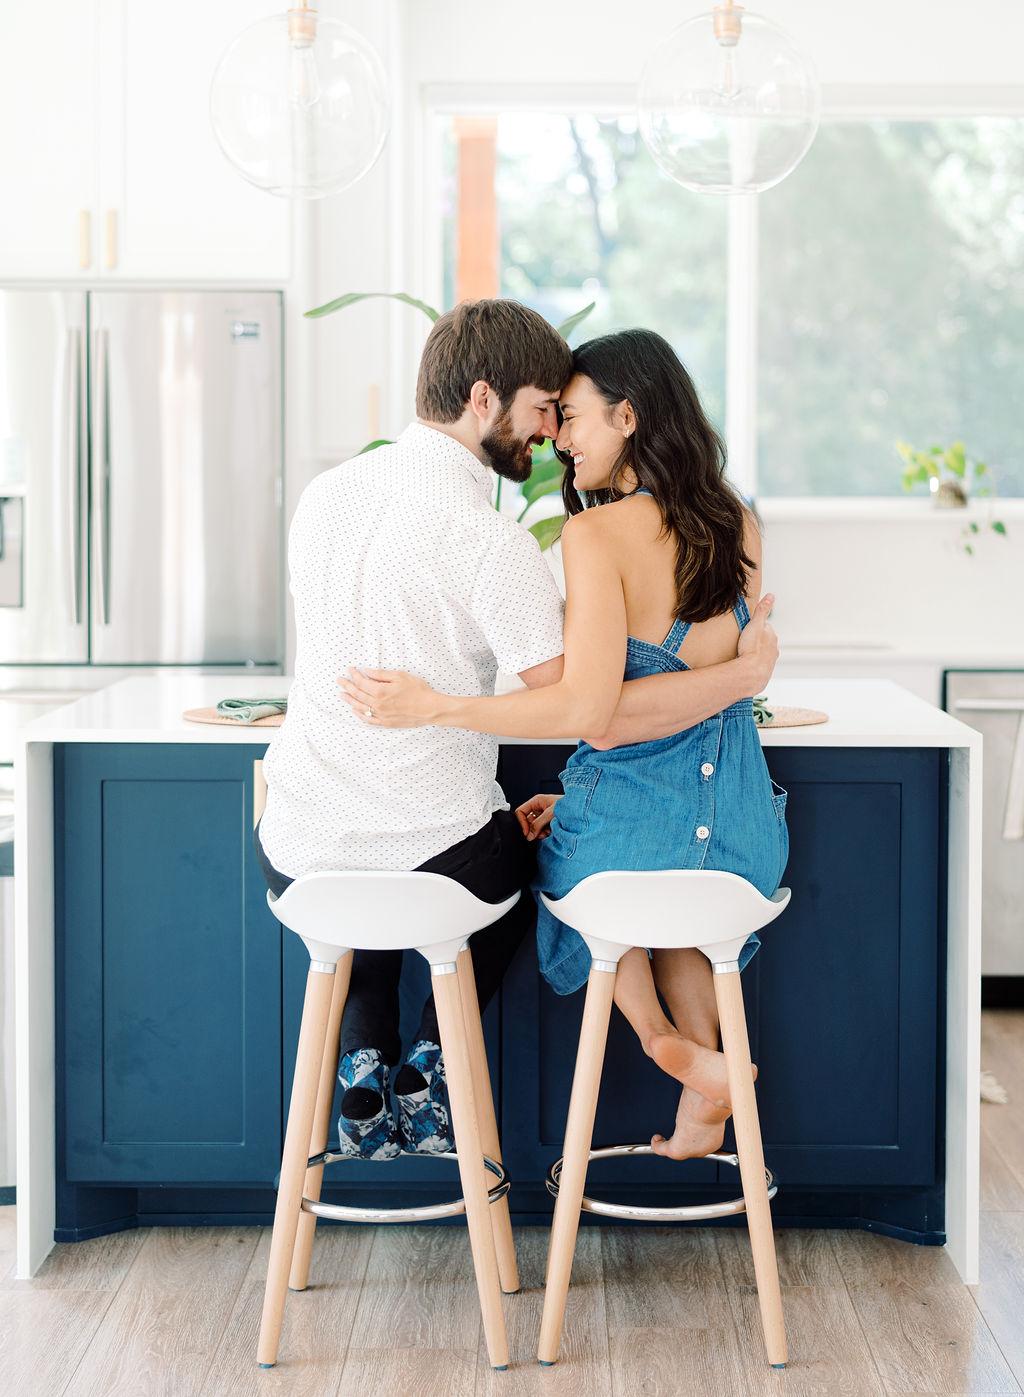 Austin-Intimate-Wedding-Elopement-Photograper-Film-Downtown-Engagement-Session-Home-47.jpg